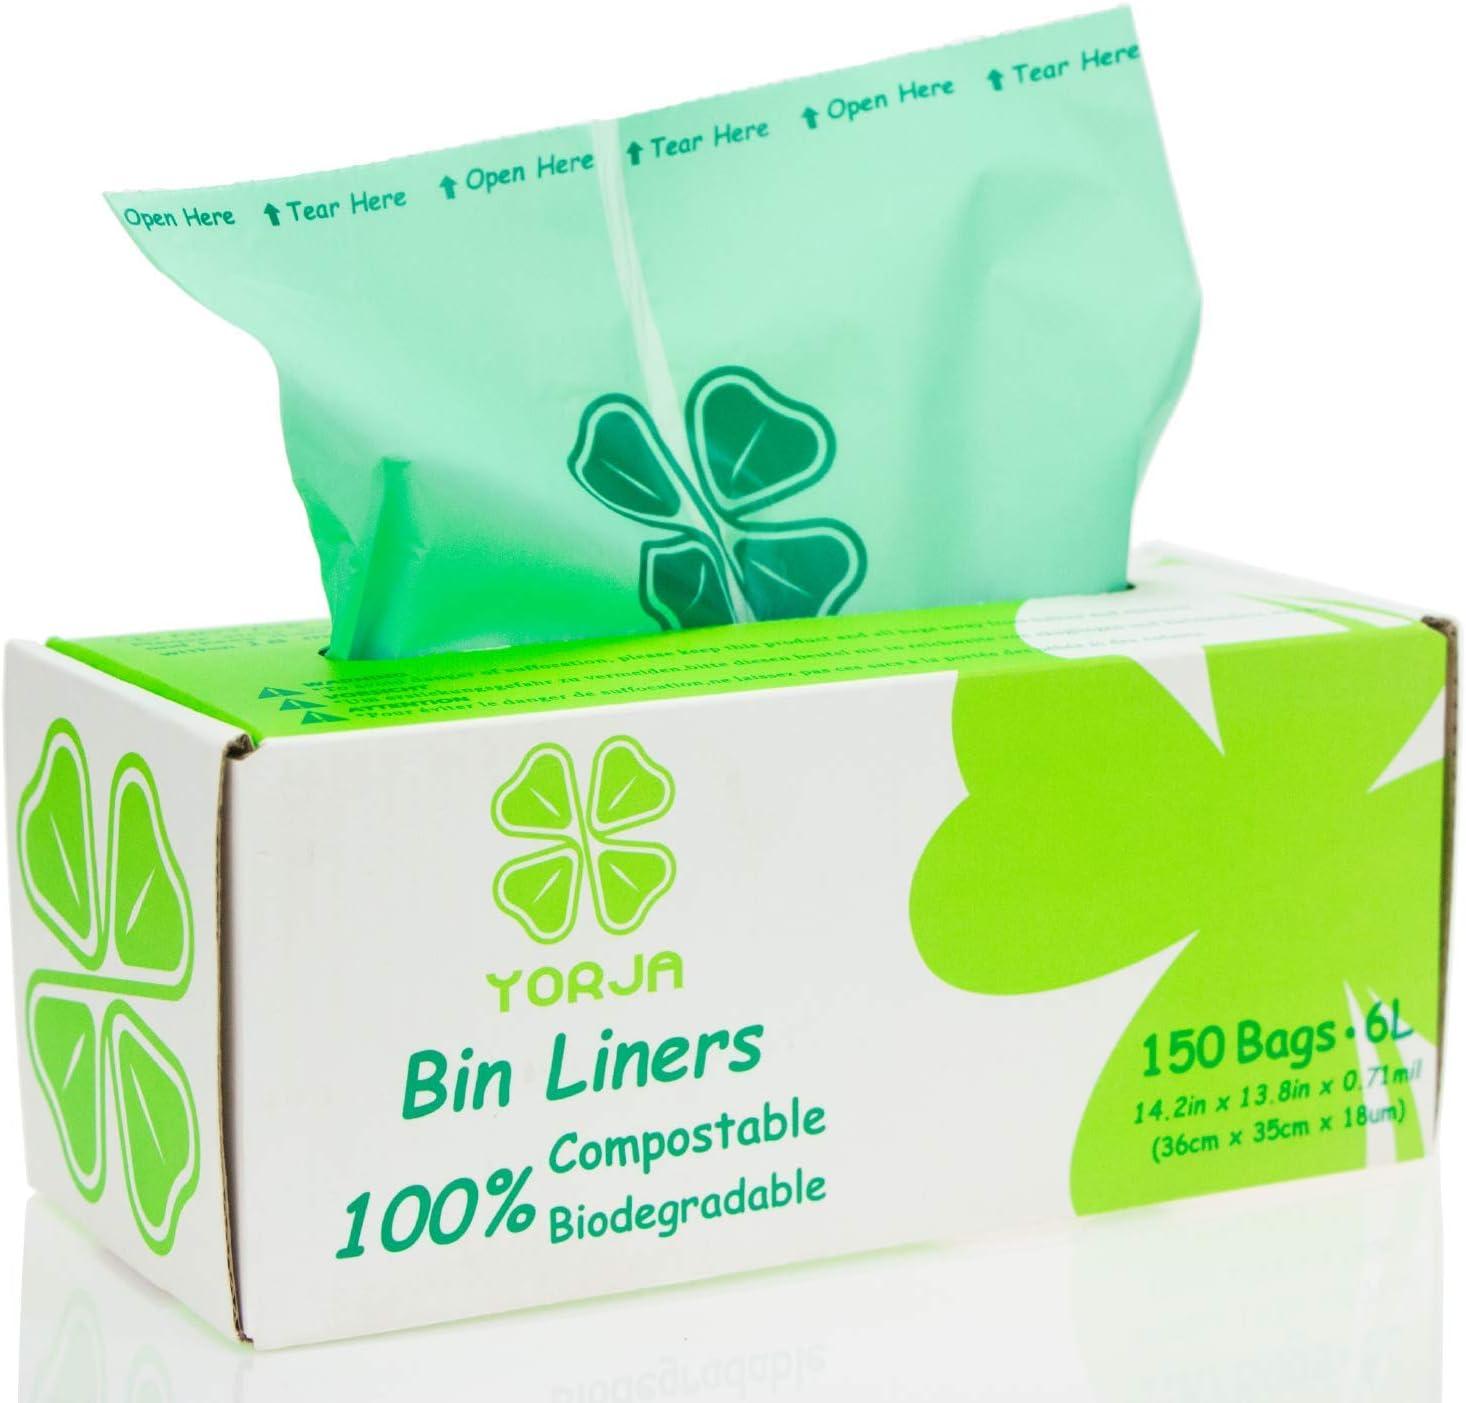 YORJA 100% compostable Biodegradable 6L Bolsa Basura Alimentos Cocina Bolsas de basura-150 Bolsas